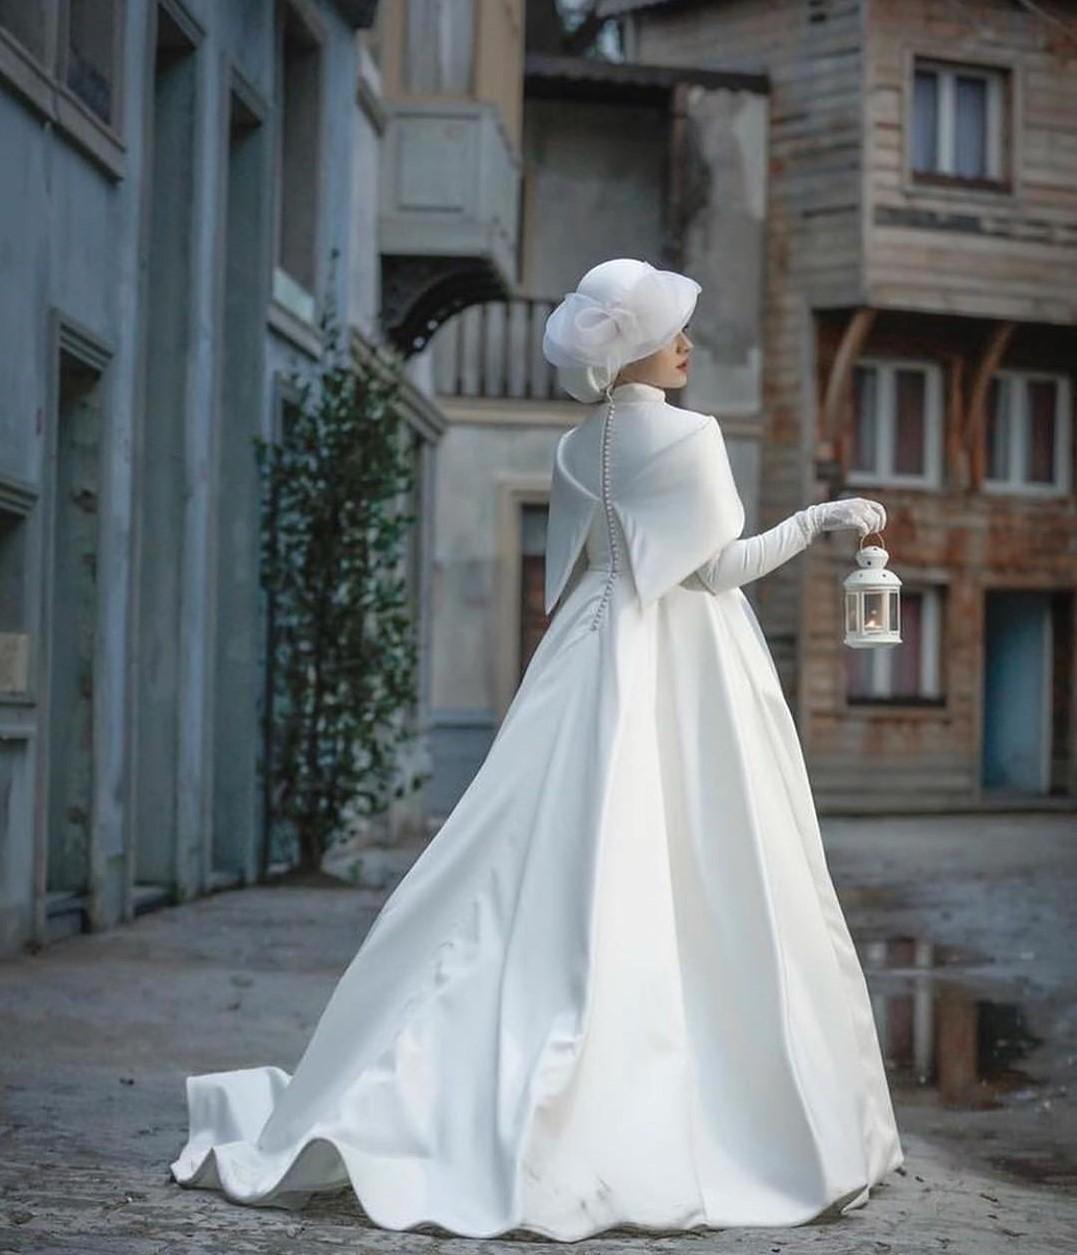 مدل لباس عروس پوشیده 2019